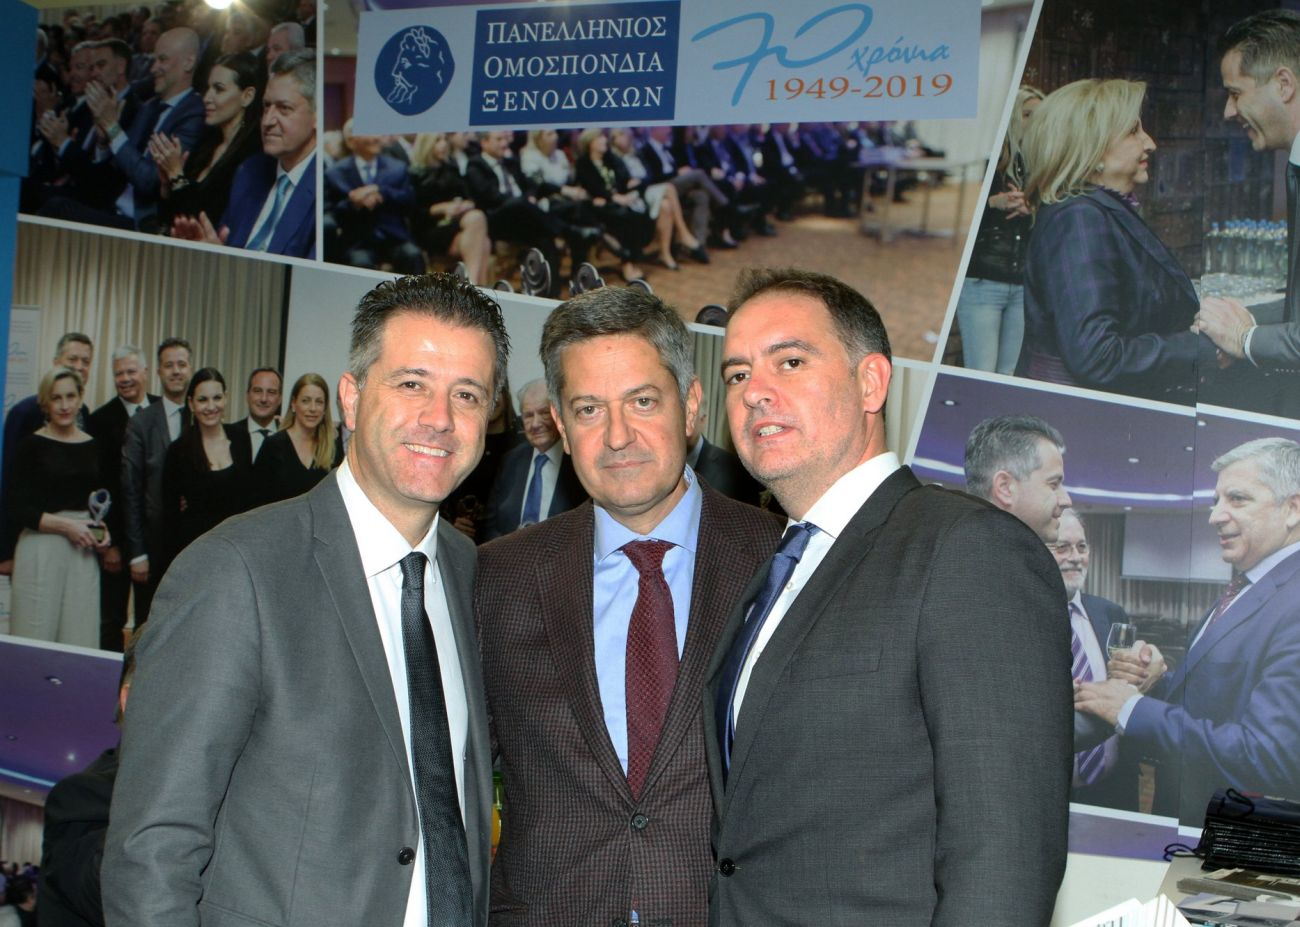 Hellenic Hoteliers Federation's president Grigoris Tasios and 1st VP, Manolis Giannoulis, with Hellenic Chamber of Hotels President Alexandros Vassilikos.